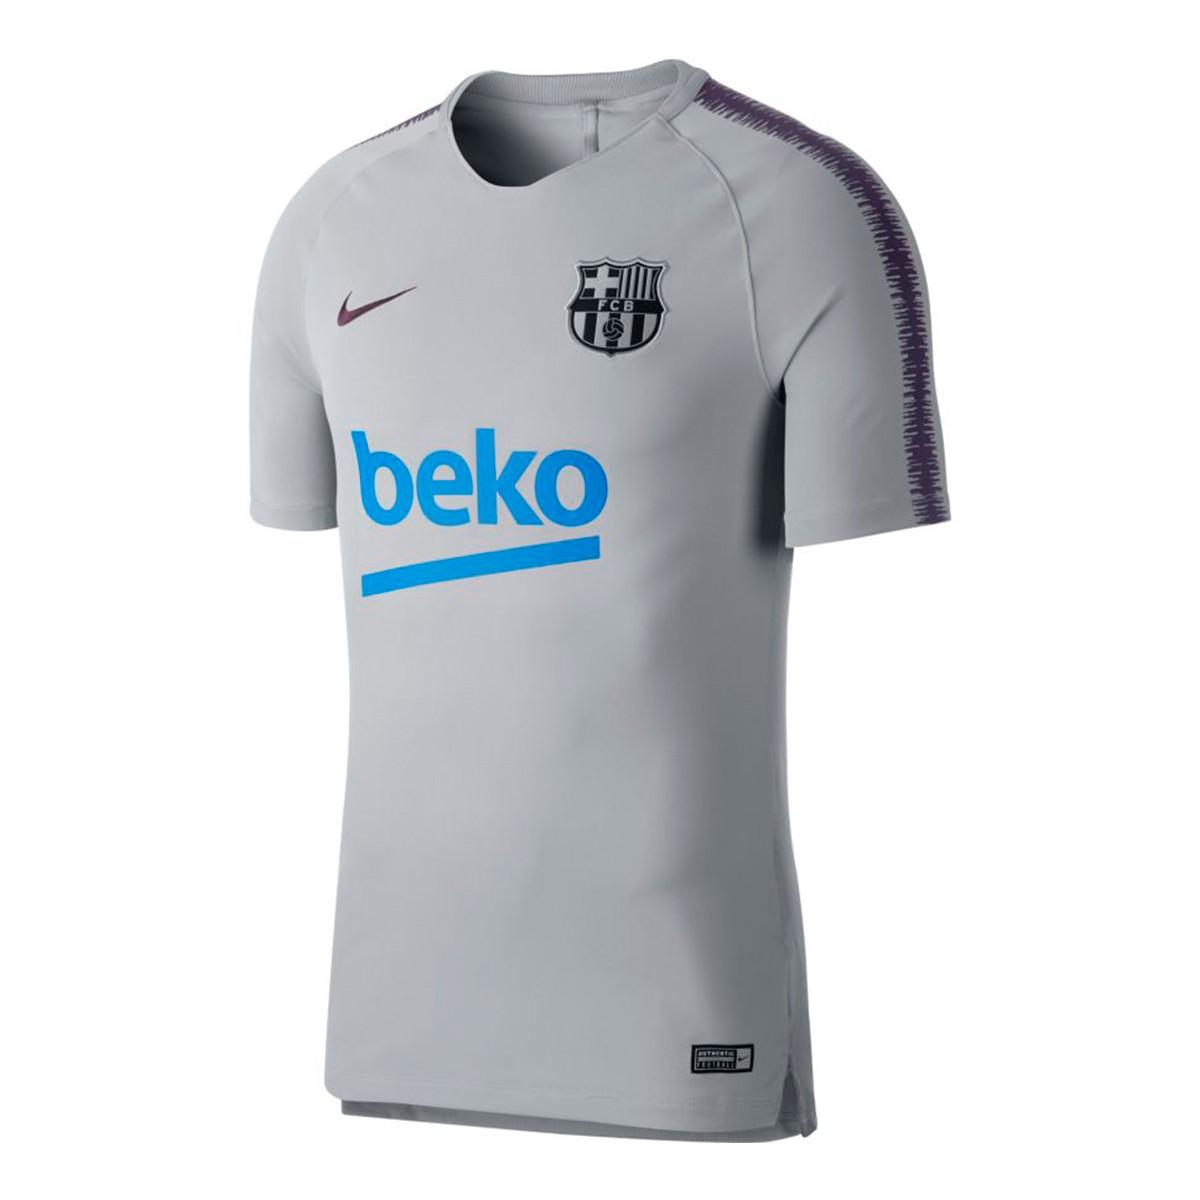 443164bf5d00c Jersey Nike FC Barcelona Squad 2018-2019 Wolf grey-Purple dynasty ...